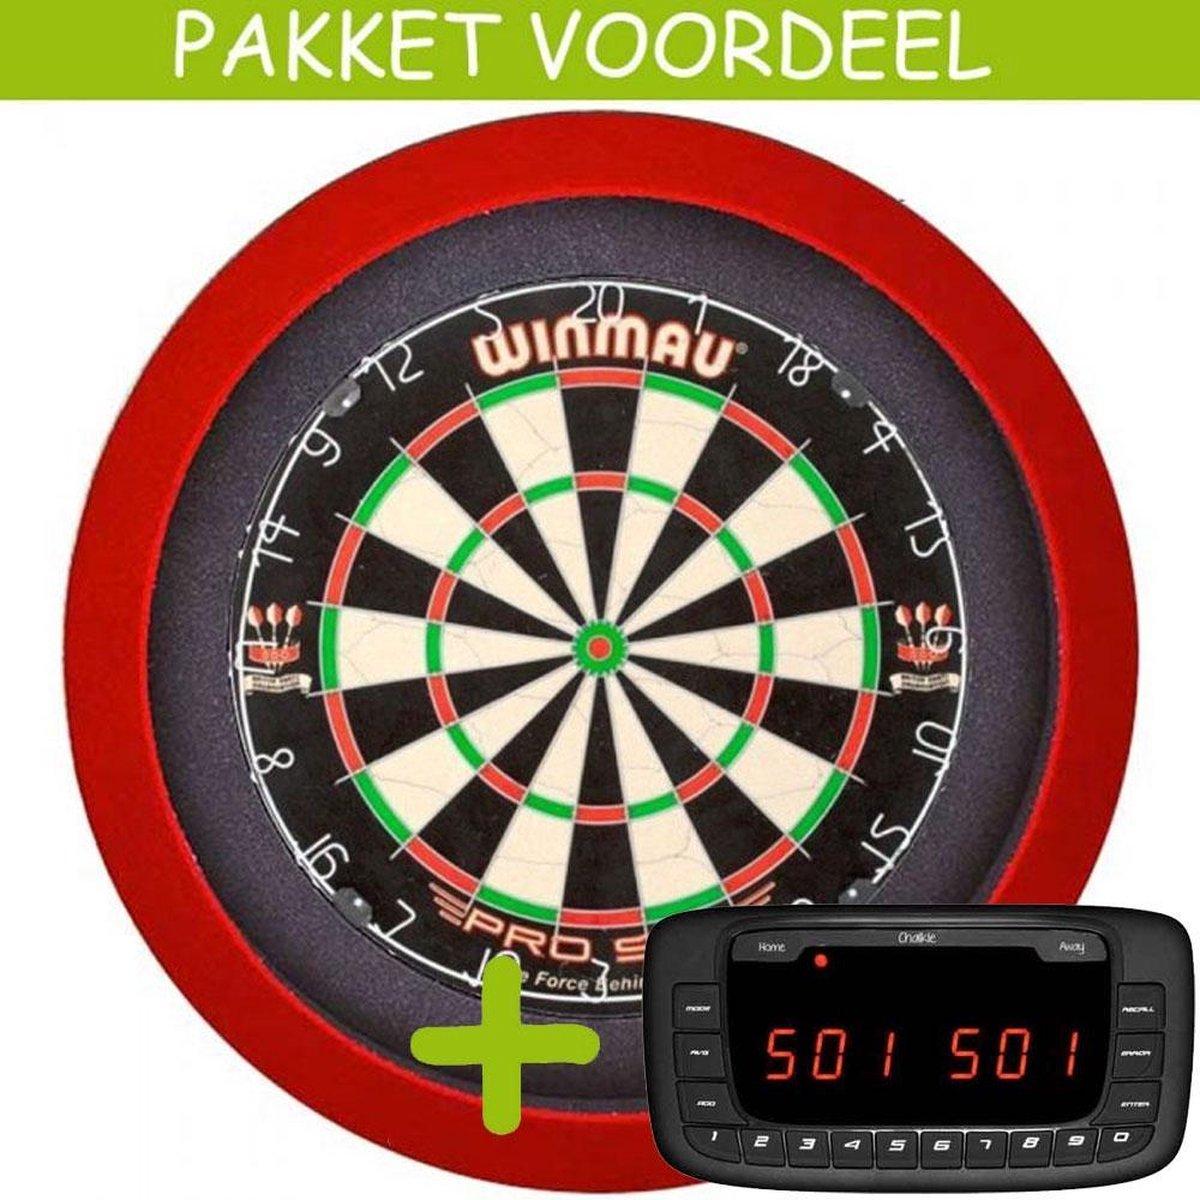 Elektronisch Dart Scorebord VoordeelPakket (Chalkie ) - Pro SFB - Dartbordverlichting Basic (Rood)